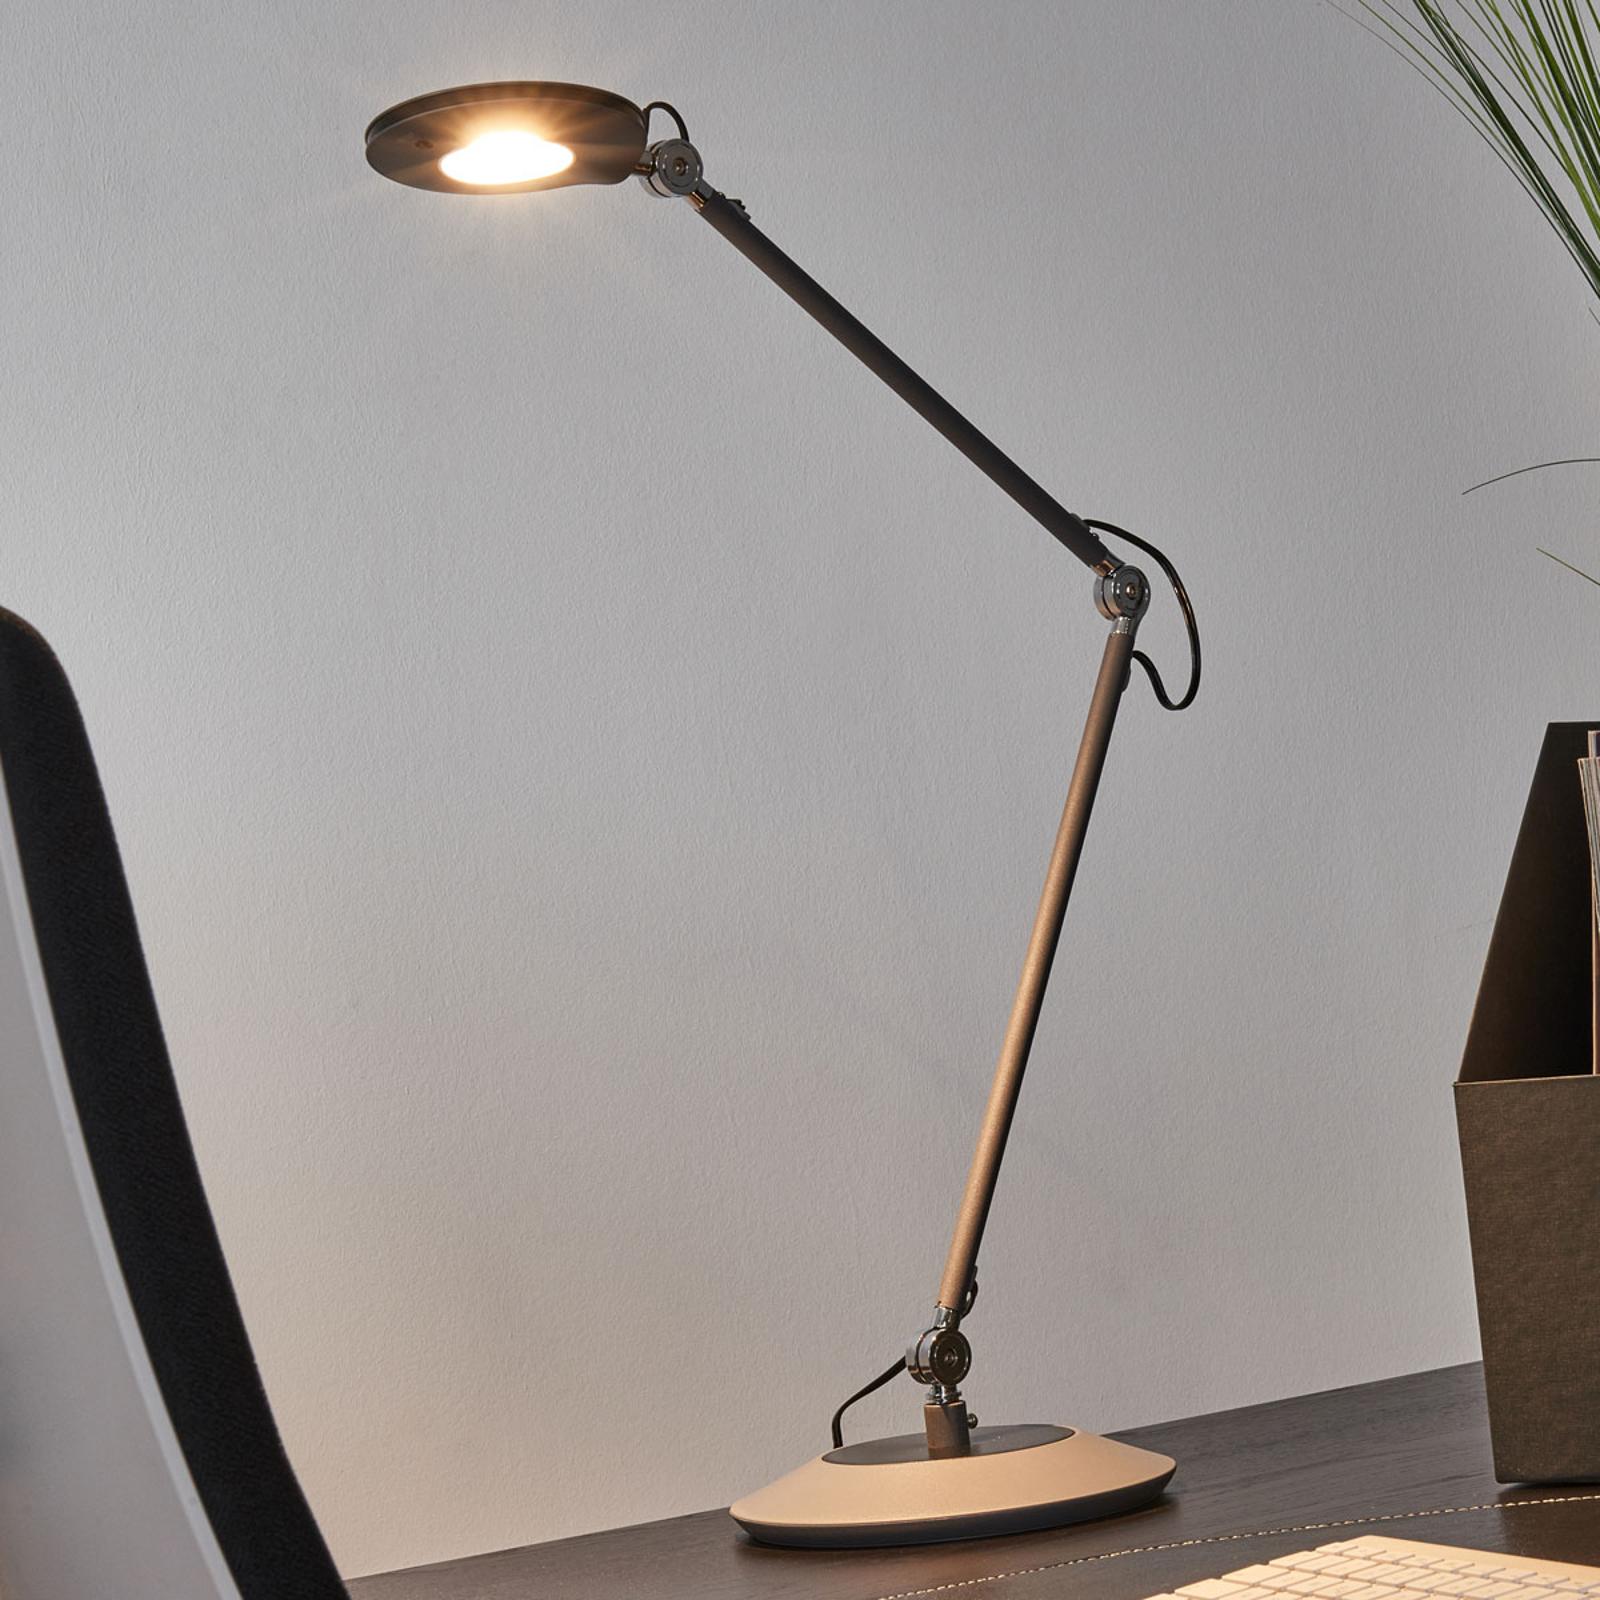 Anthrazitfarbene LED-Tischleuchte Roderic